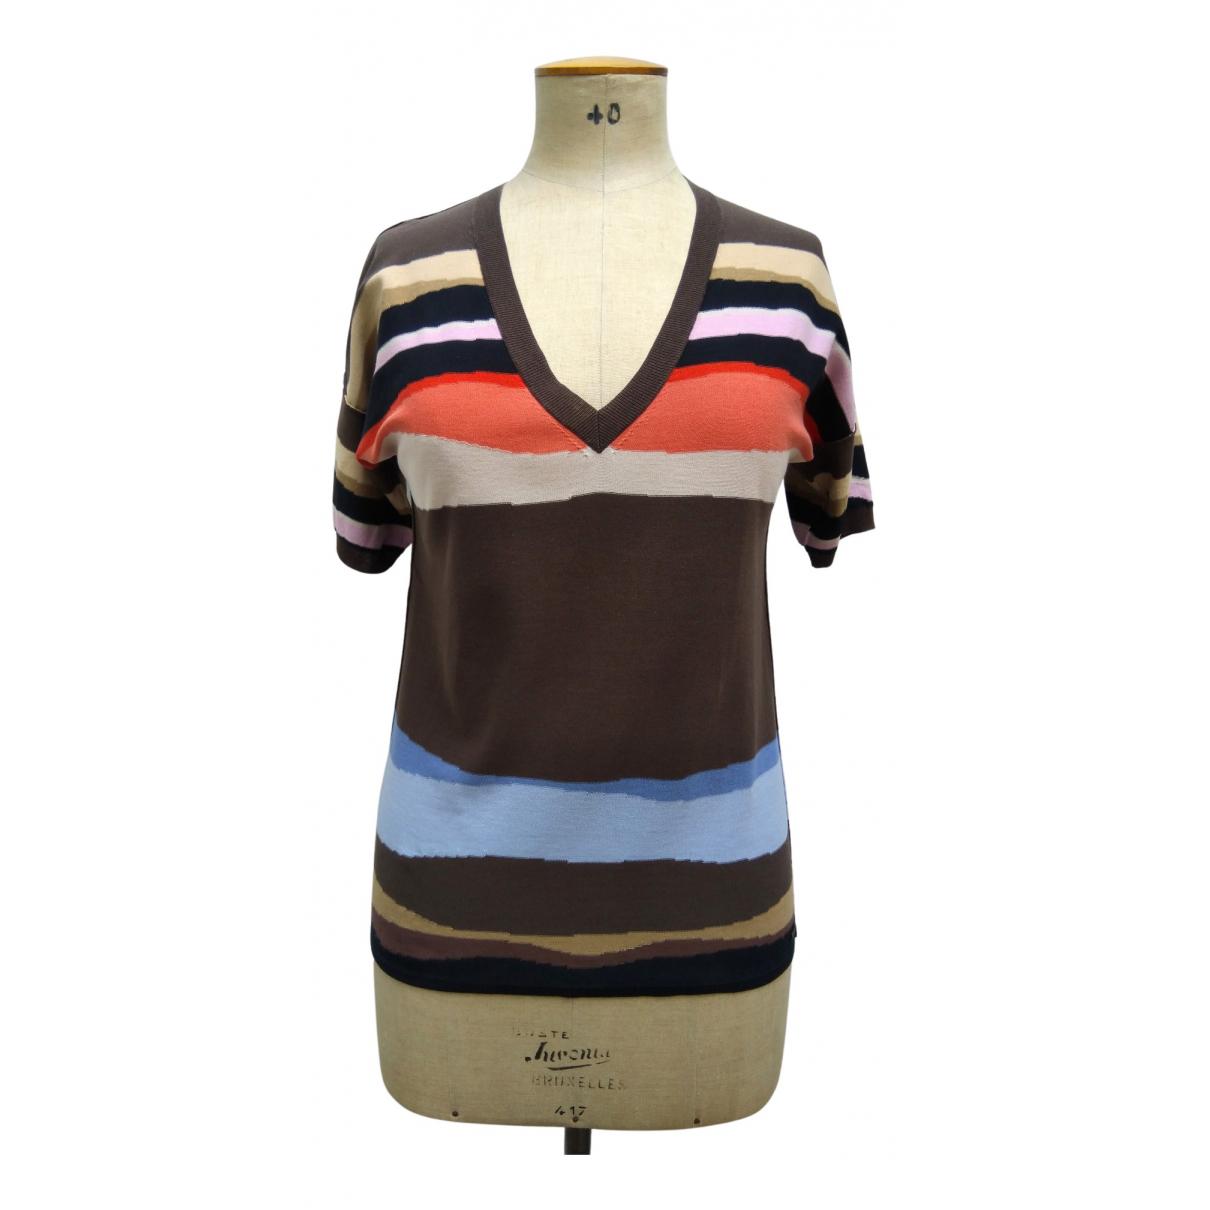 Sonia Rykiel - Pull   pour femme en coton - multicolore